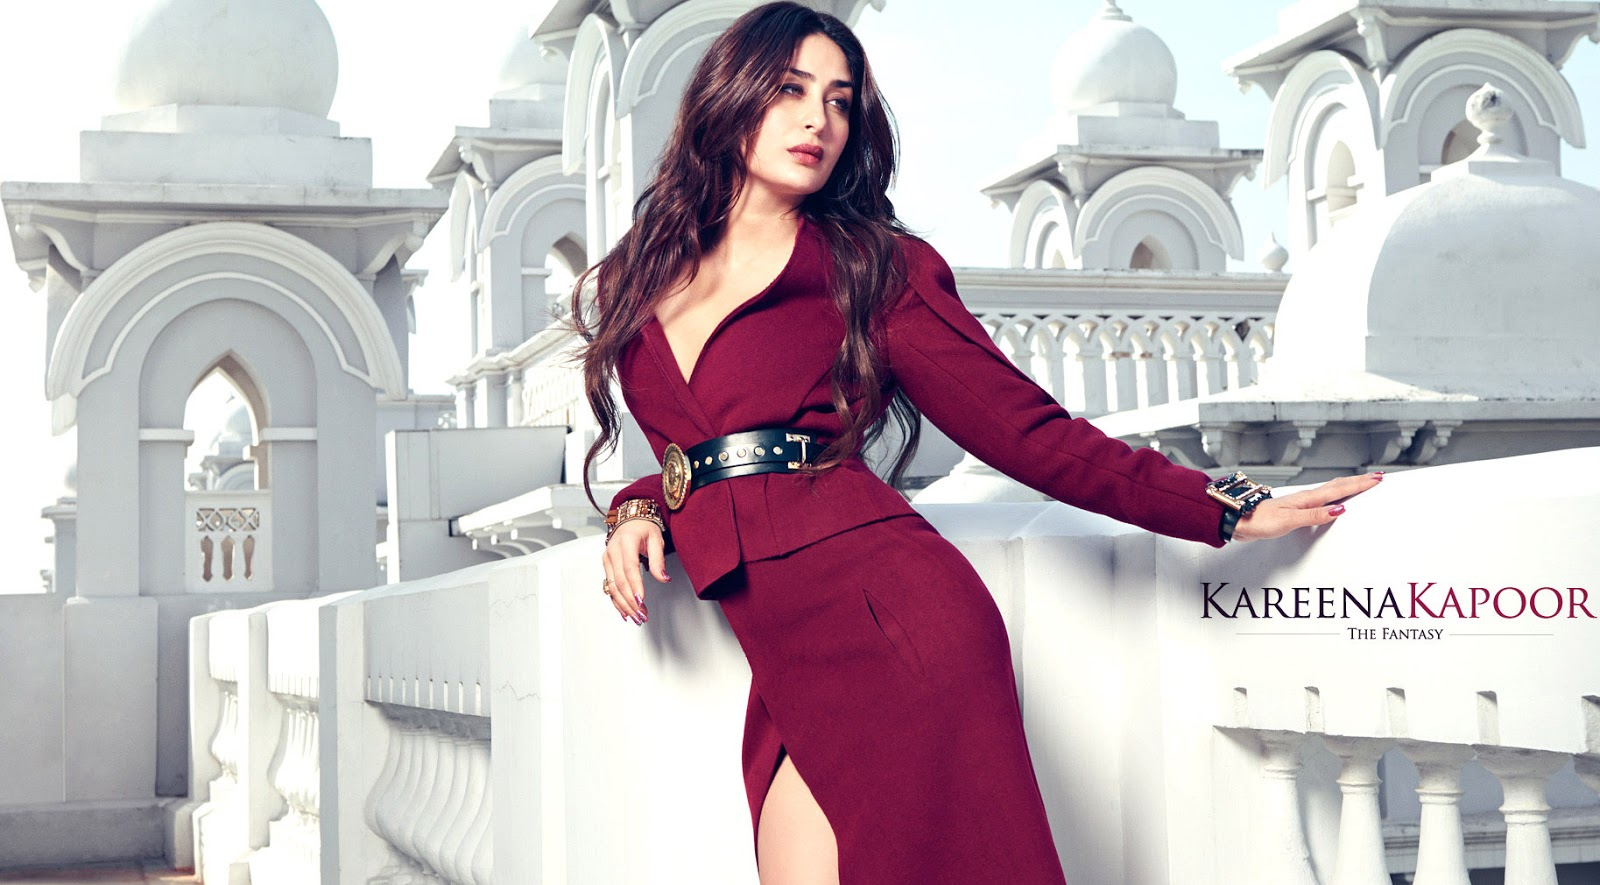 Kareena Kapoor HD Pics 2016